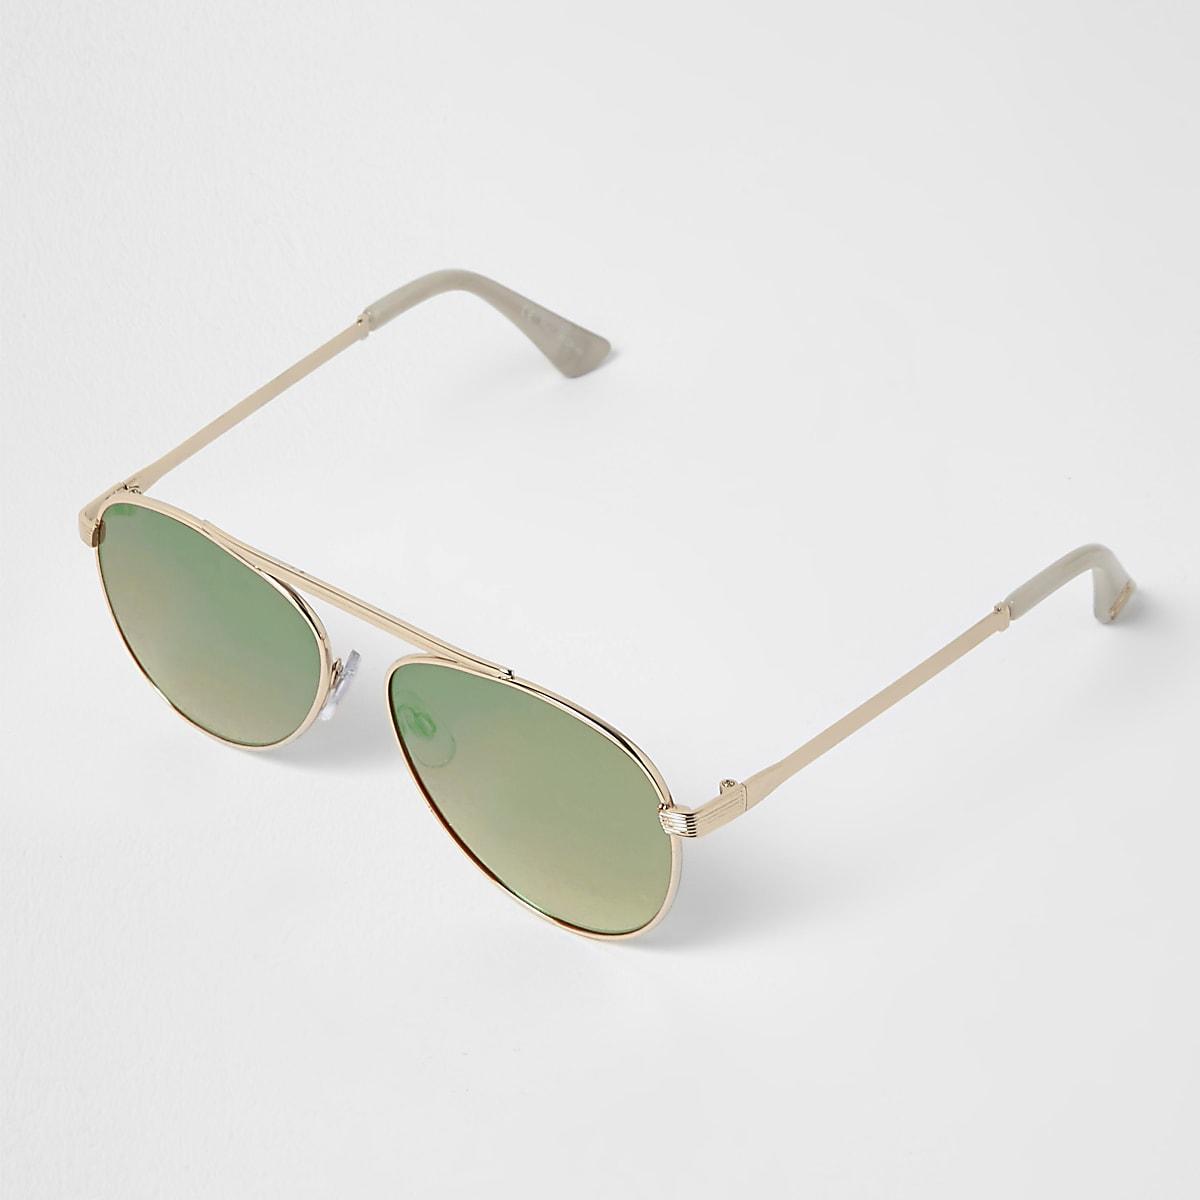 e918adba3925da ... Goudkleurige zonnebril met brug en groene spiegelglazen ...